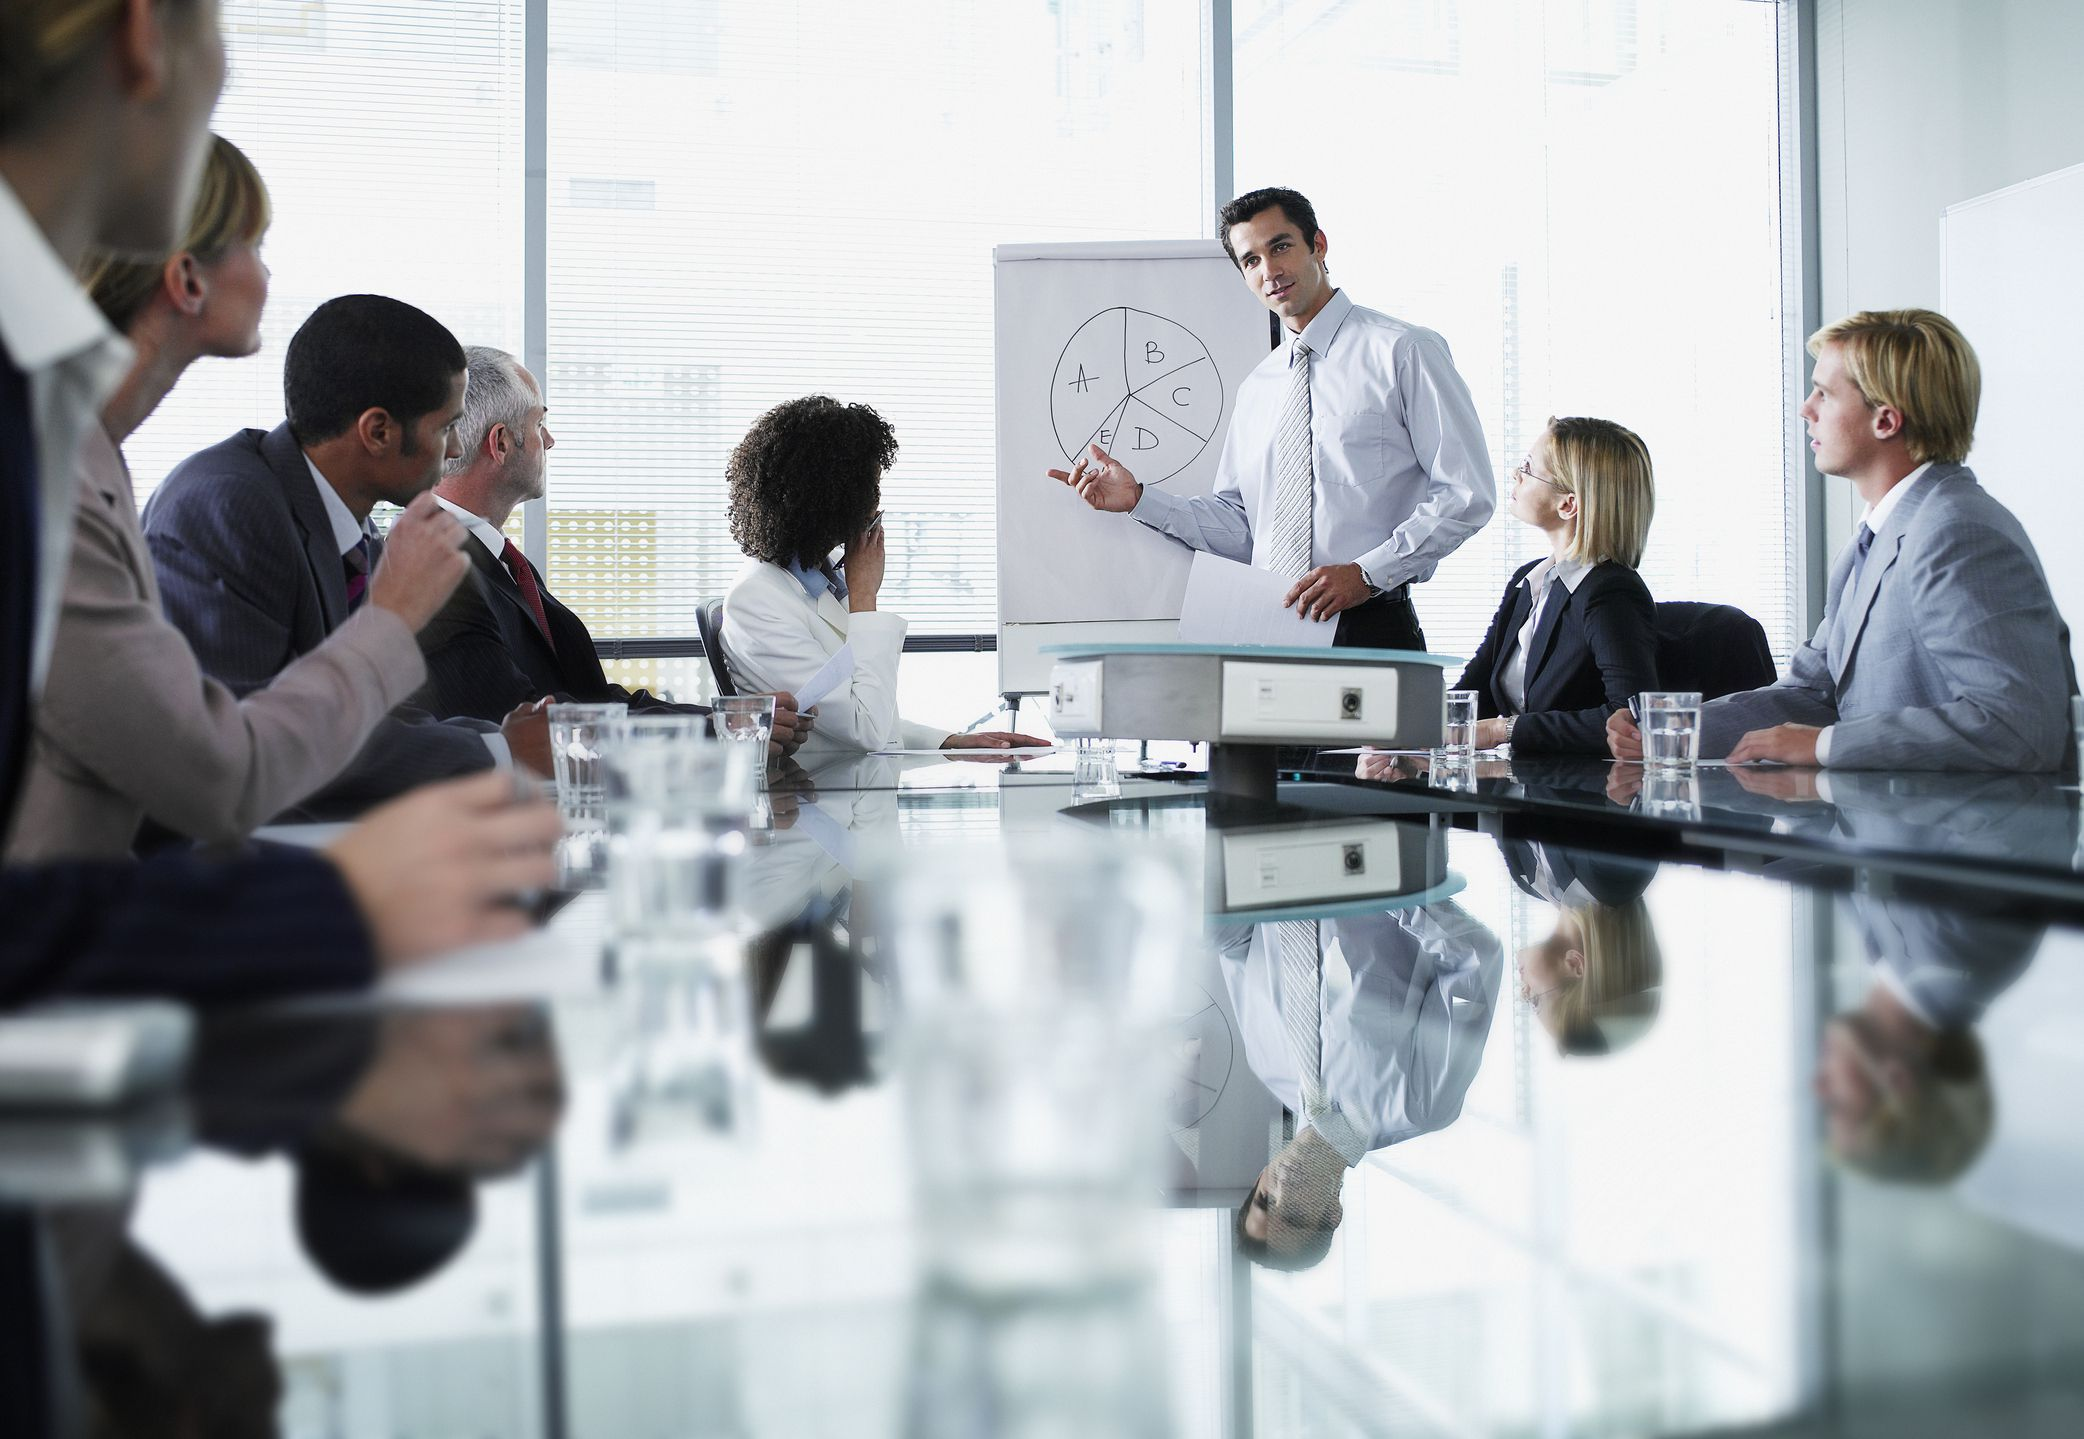 Improving Team Effectiveness